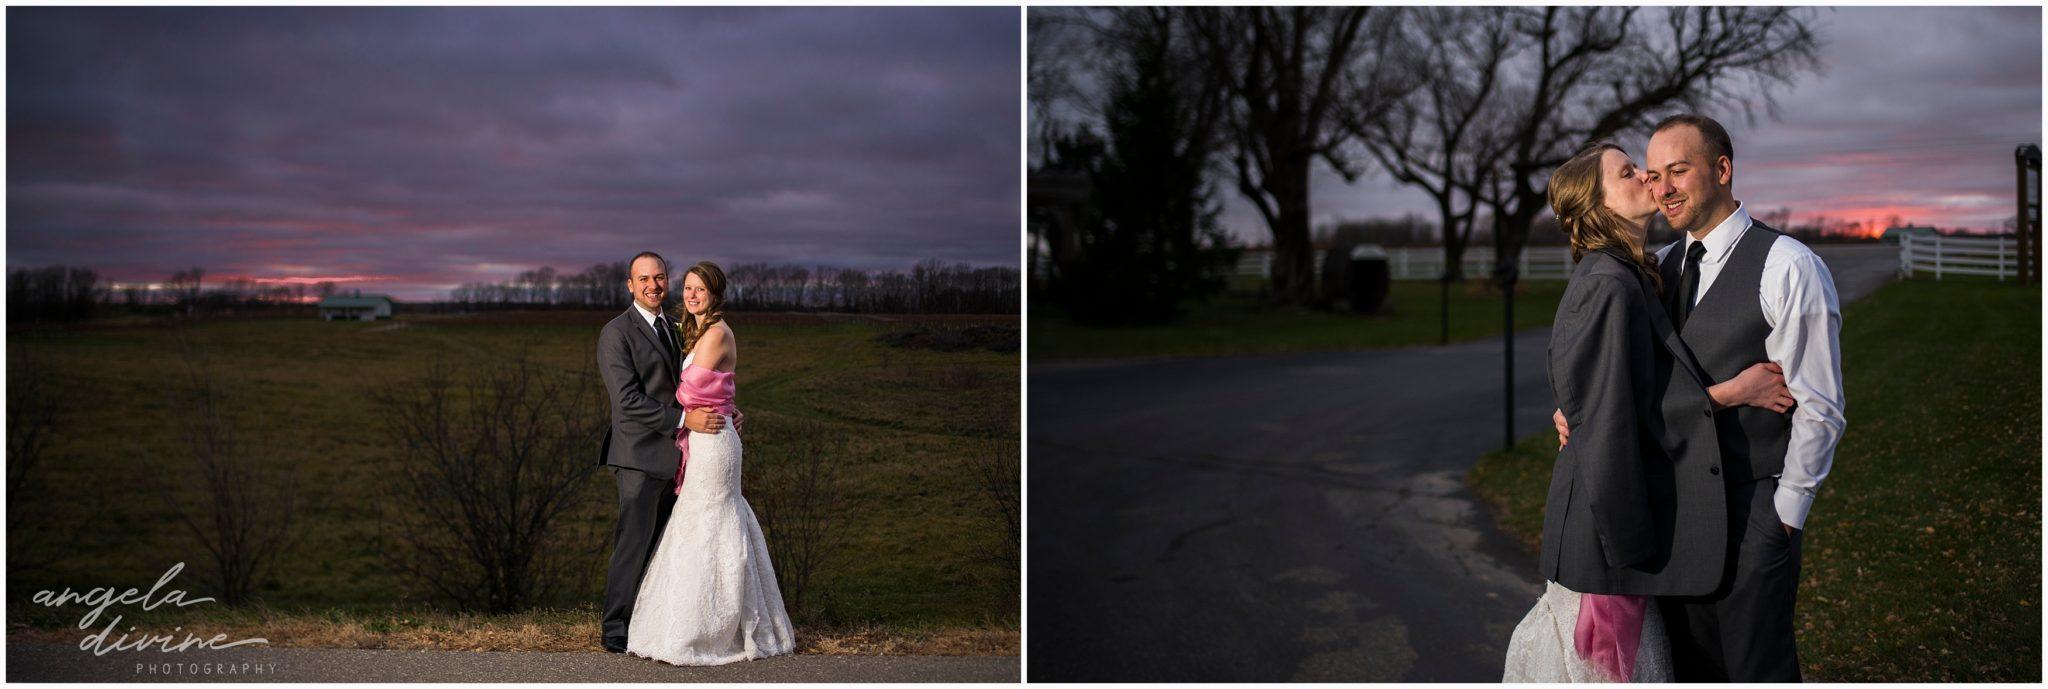 Carlos Creek Winery Wedding Sunset